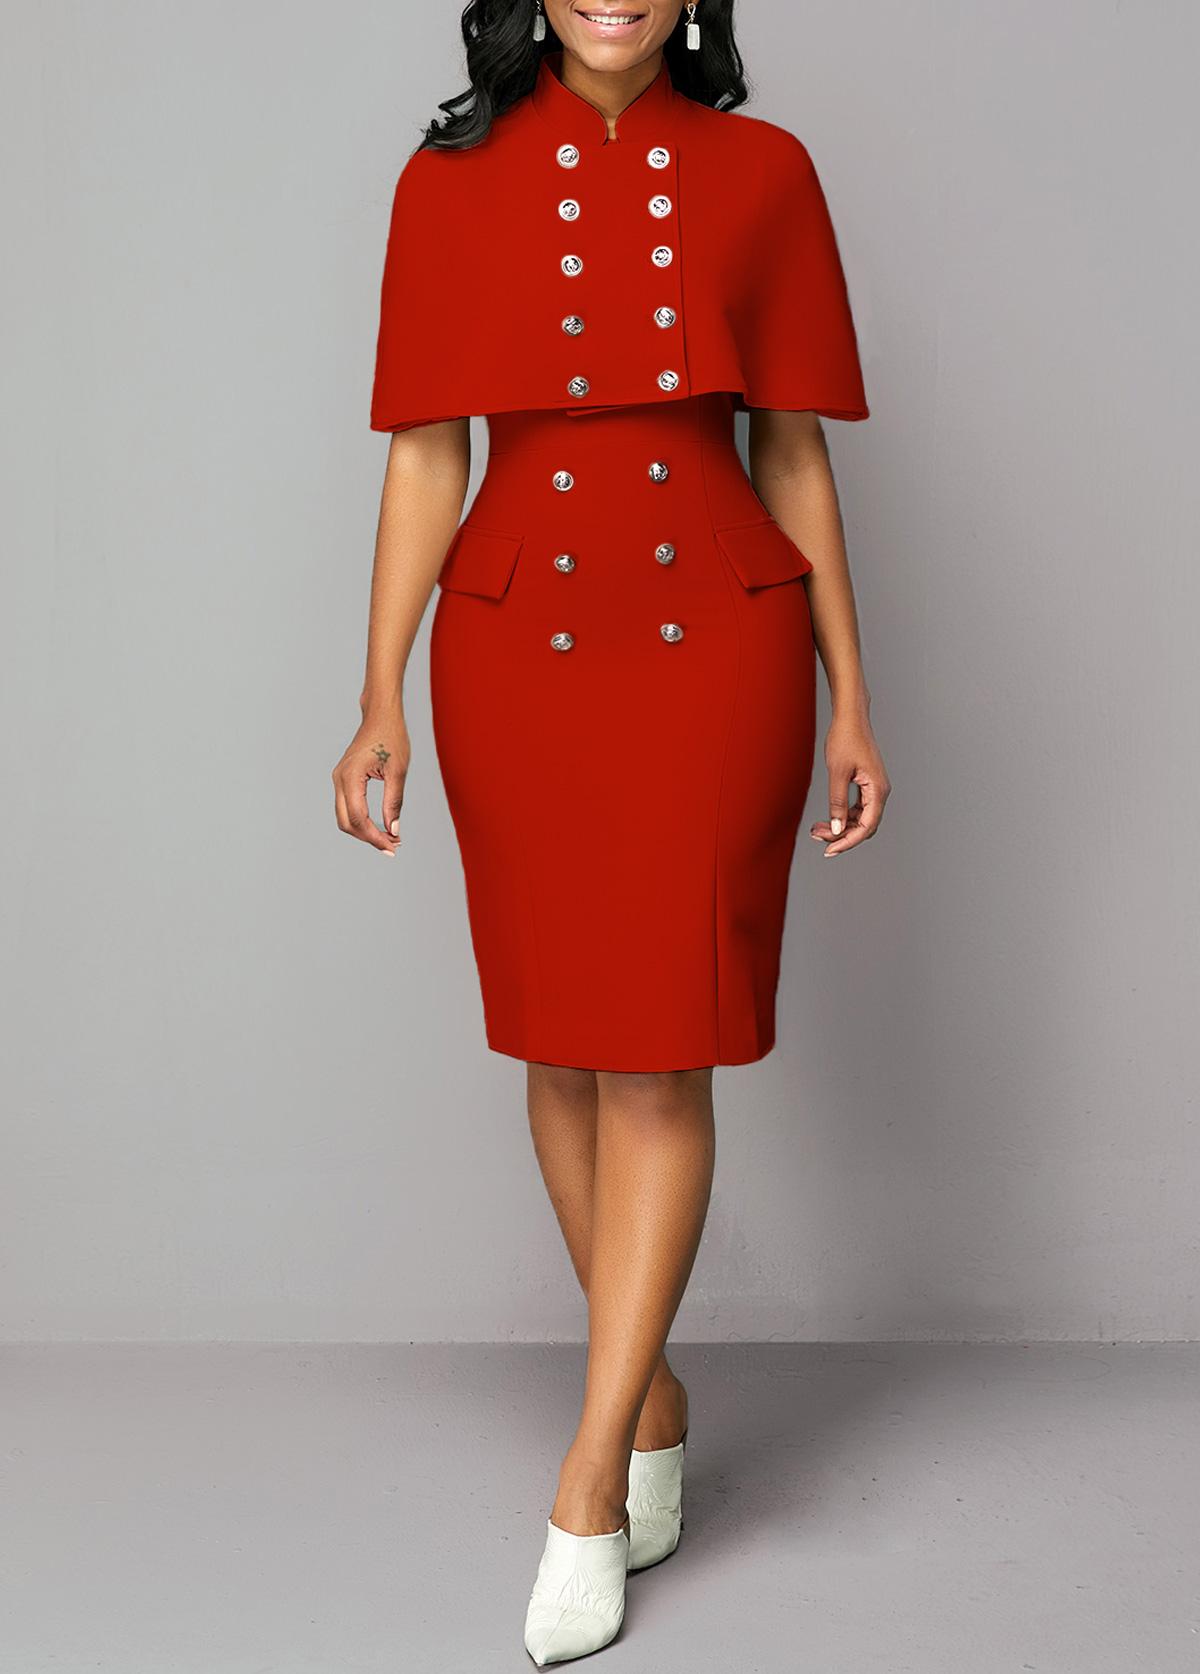 Cape Shoulder Top and Button Detail Sheath Dress